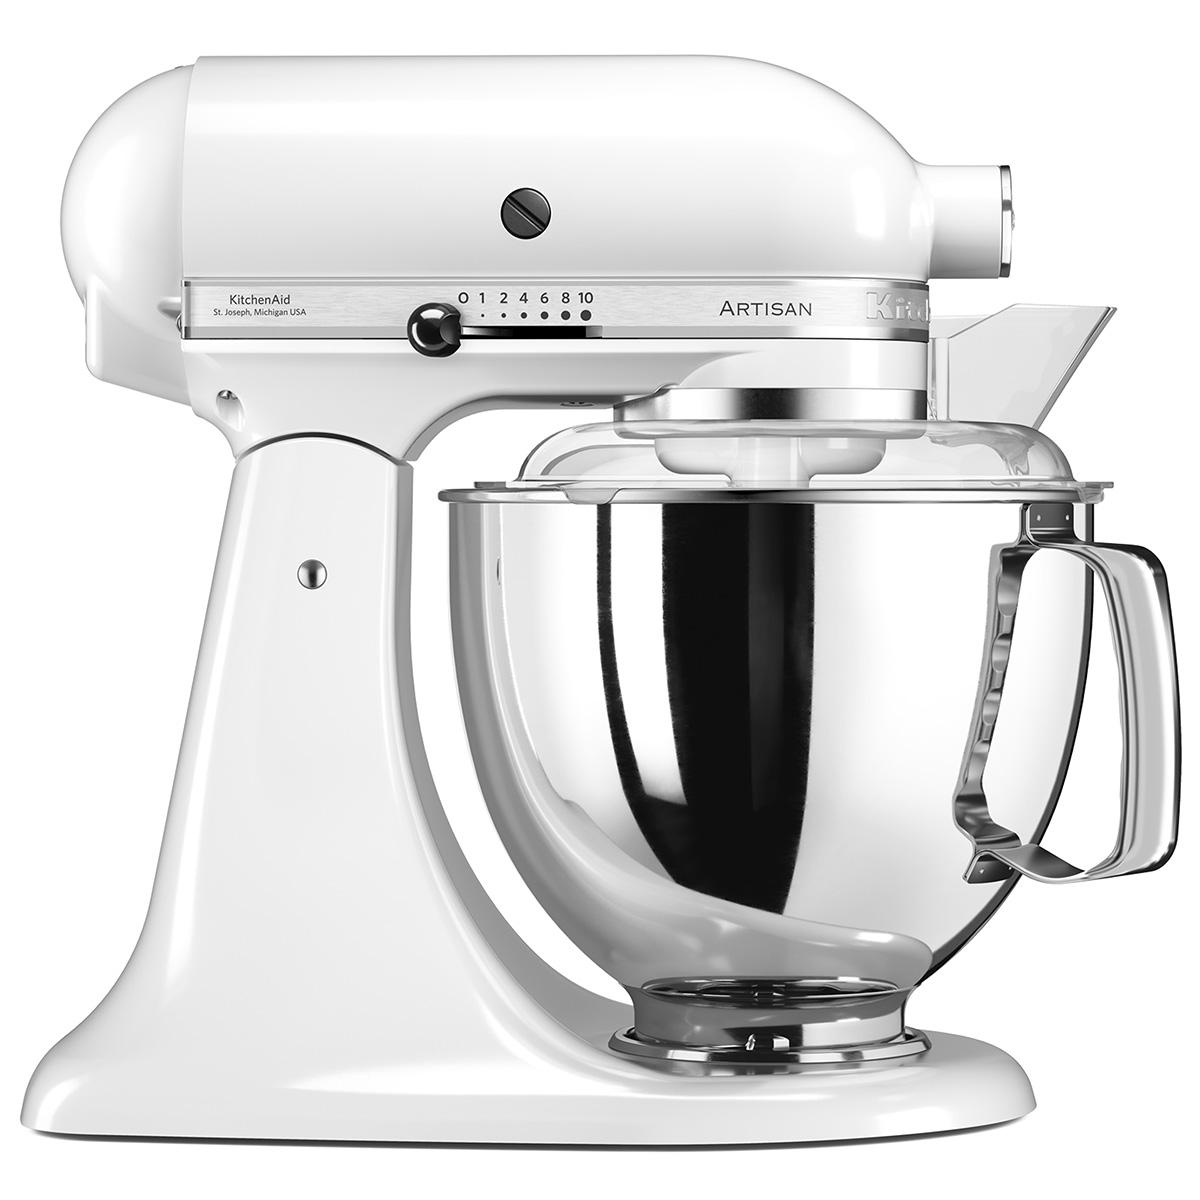 KitchenAid køkkenmaskine - Artisan - Hvid